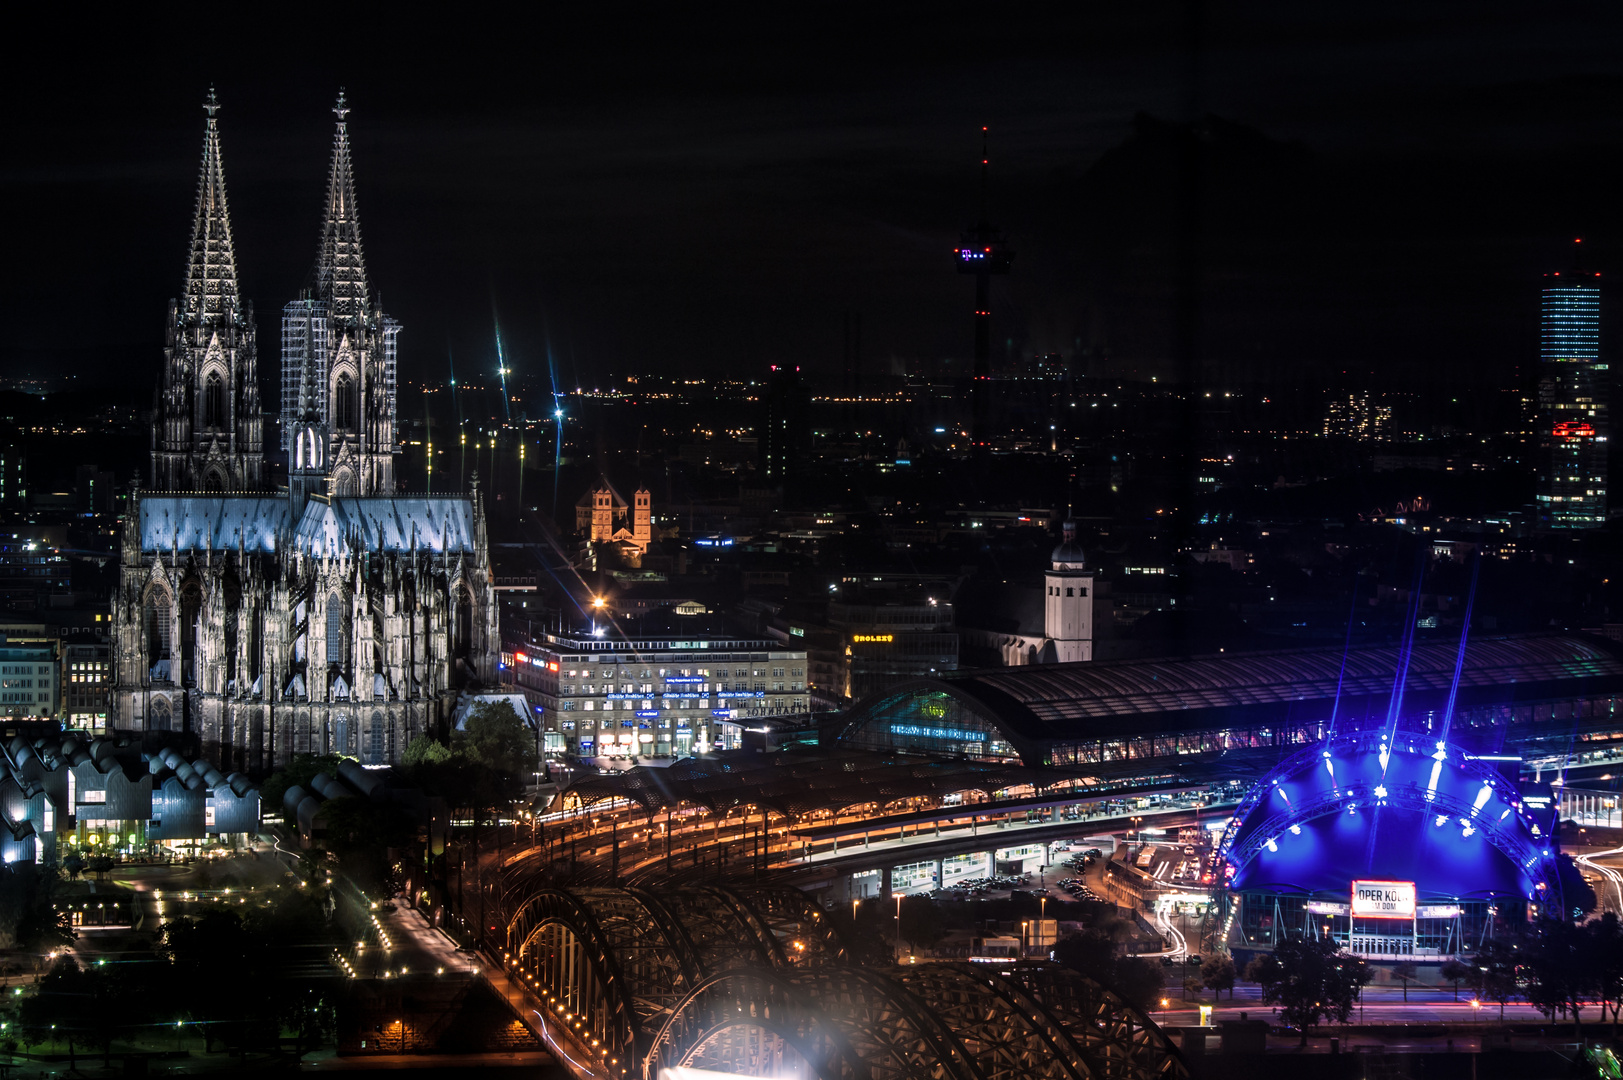 Good Night Cologne